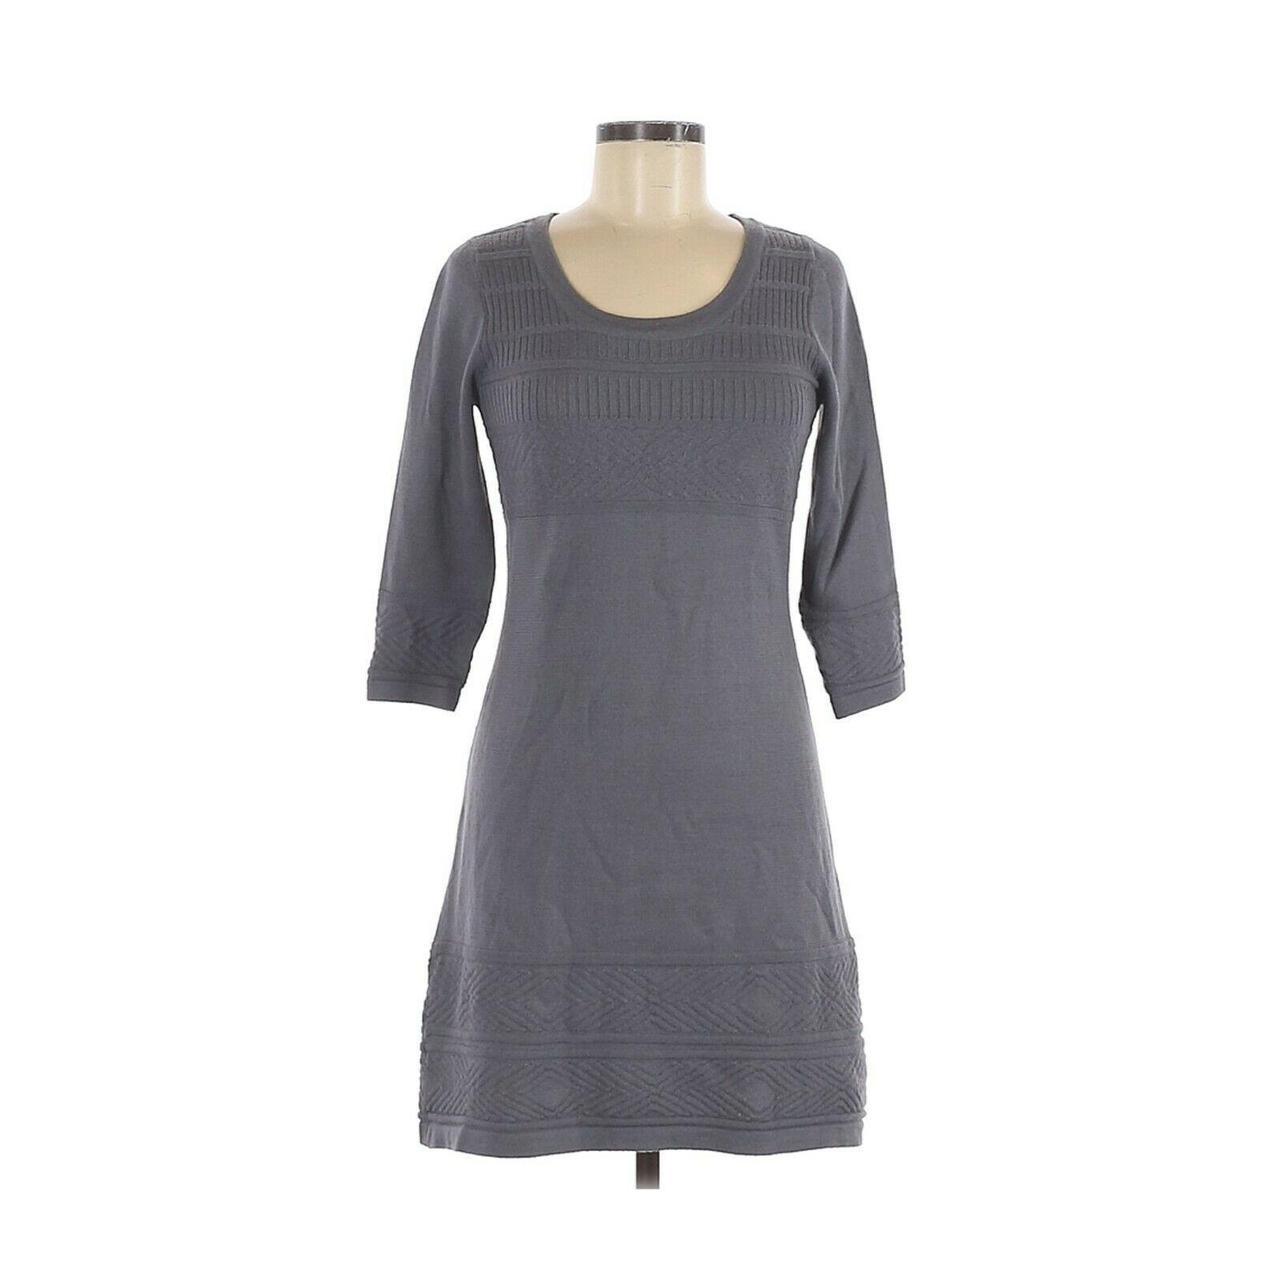 Product Image 1 - Monsoon Women's Sweater Dress Size